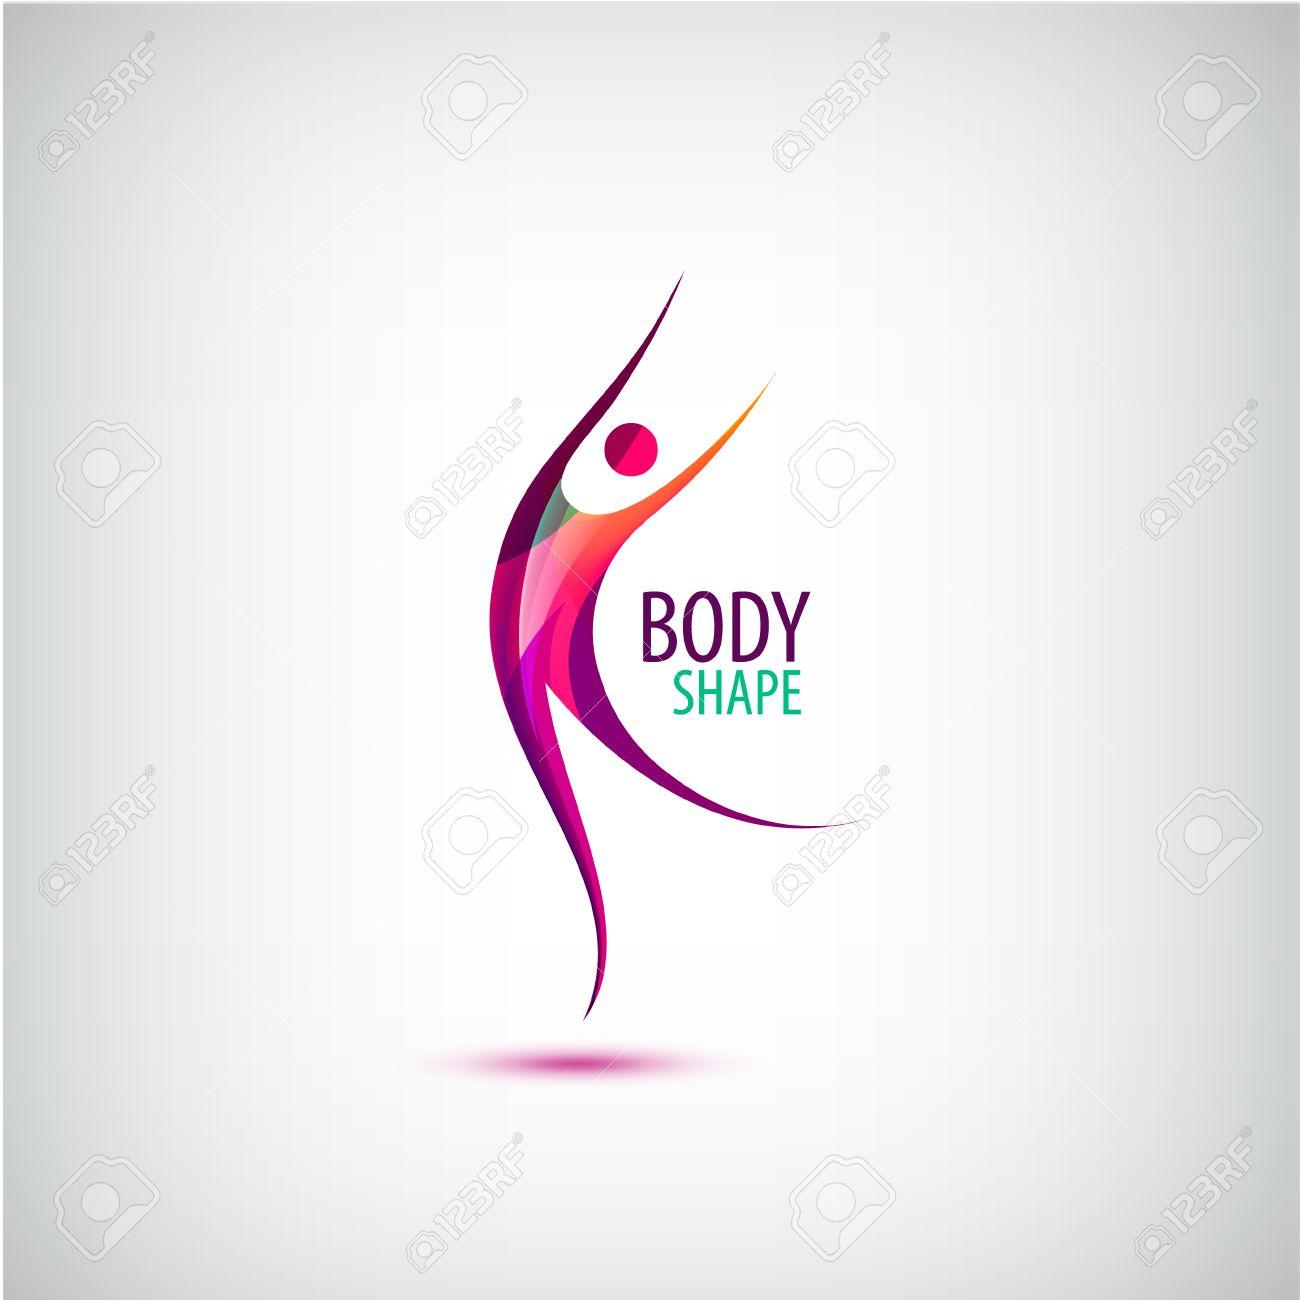 Vector body shape logo. Human icon, dancing, sport, positive man. Healthy life sign Stock Vector - 61051792